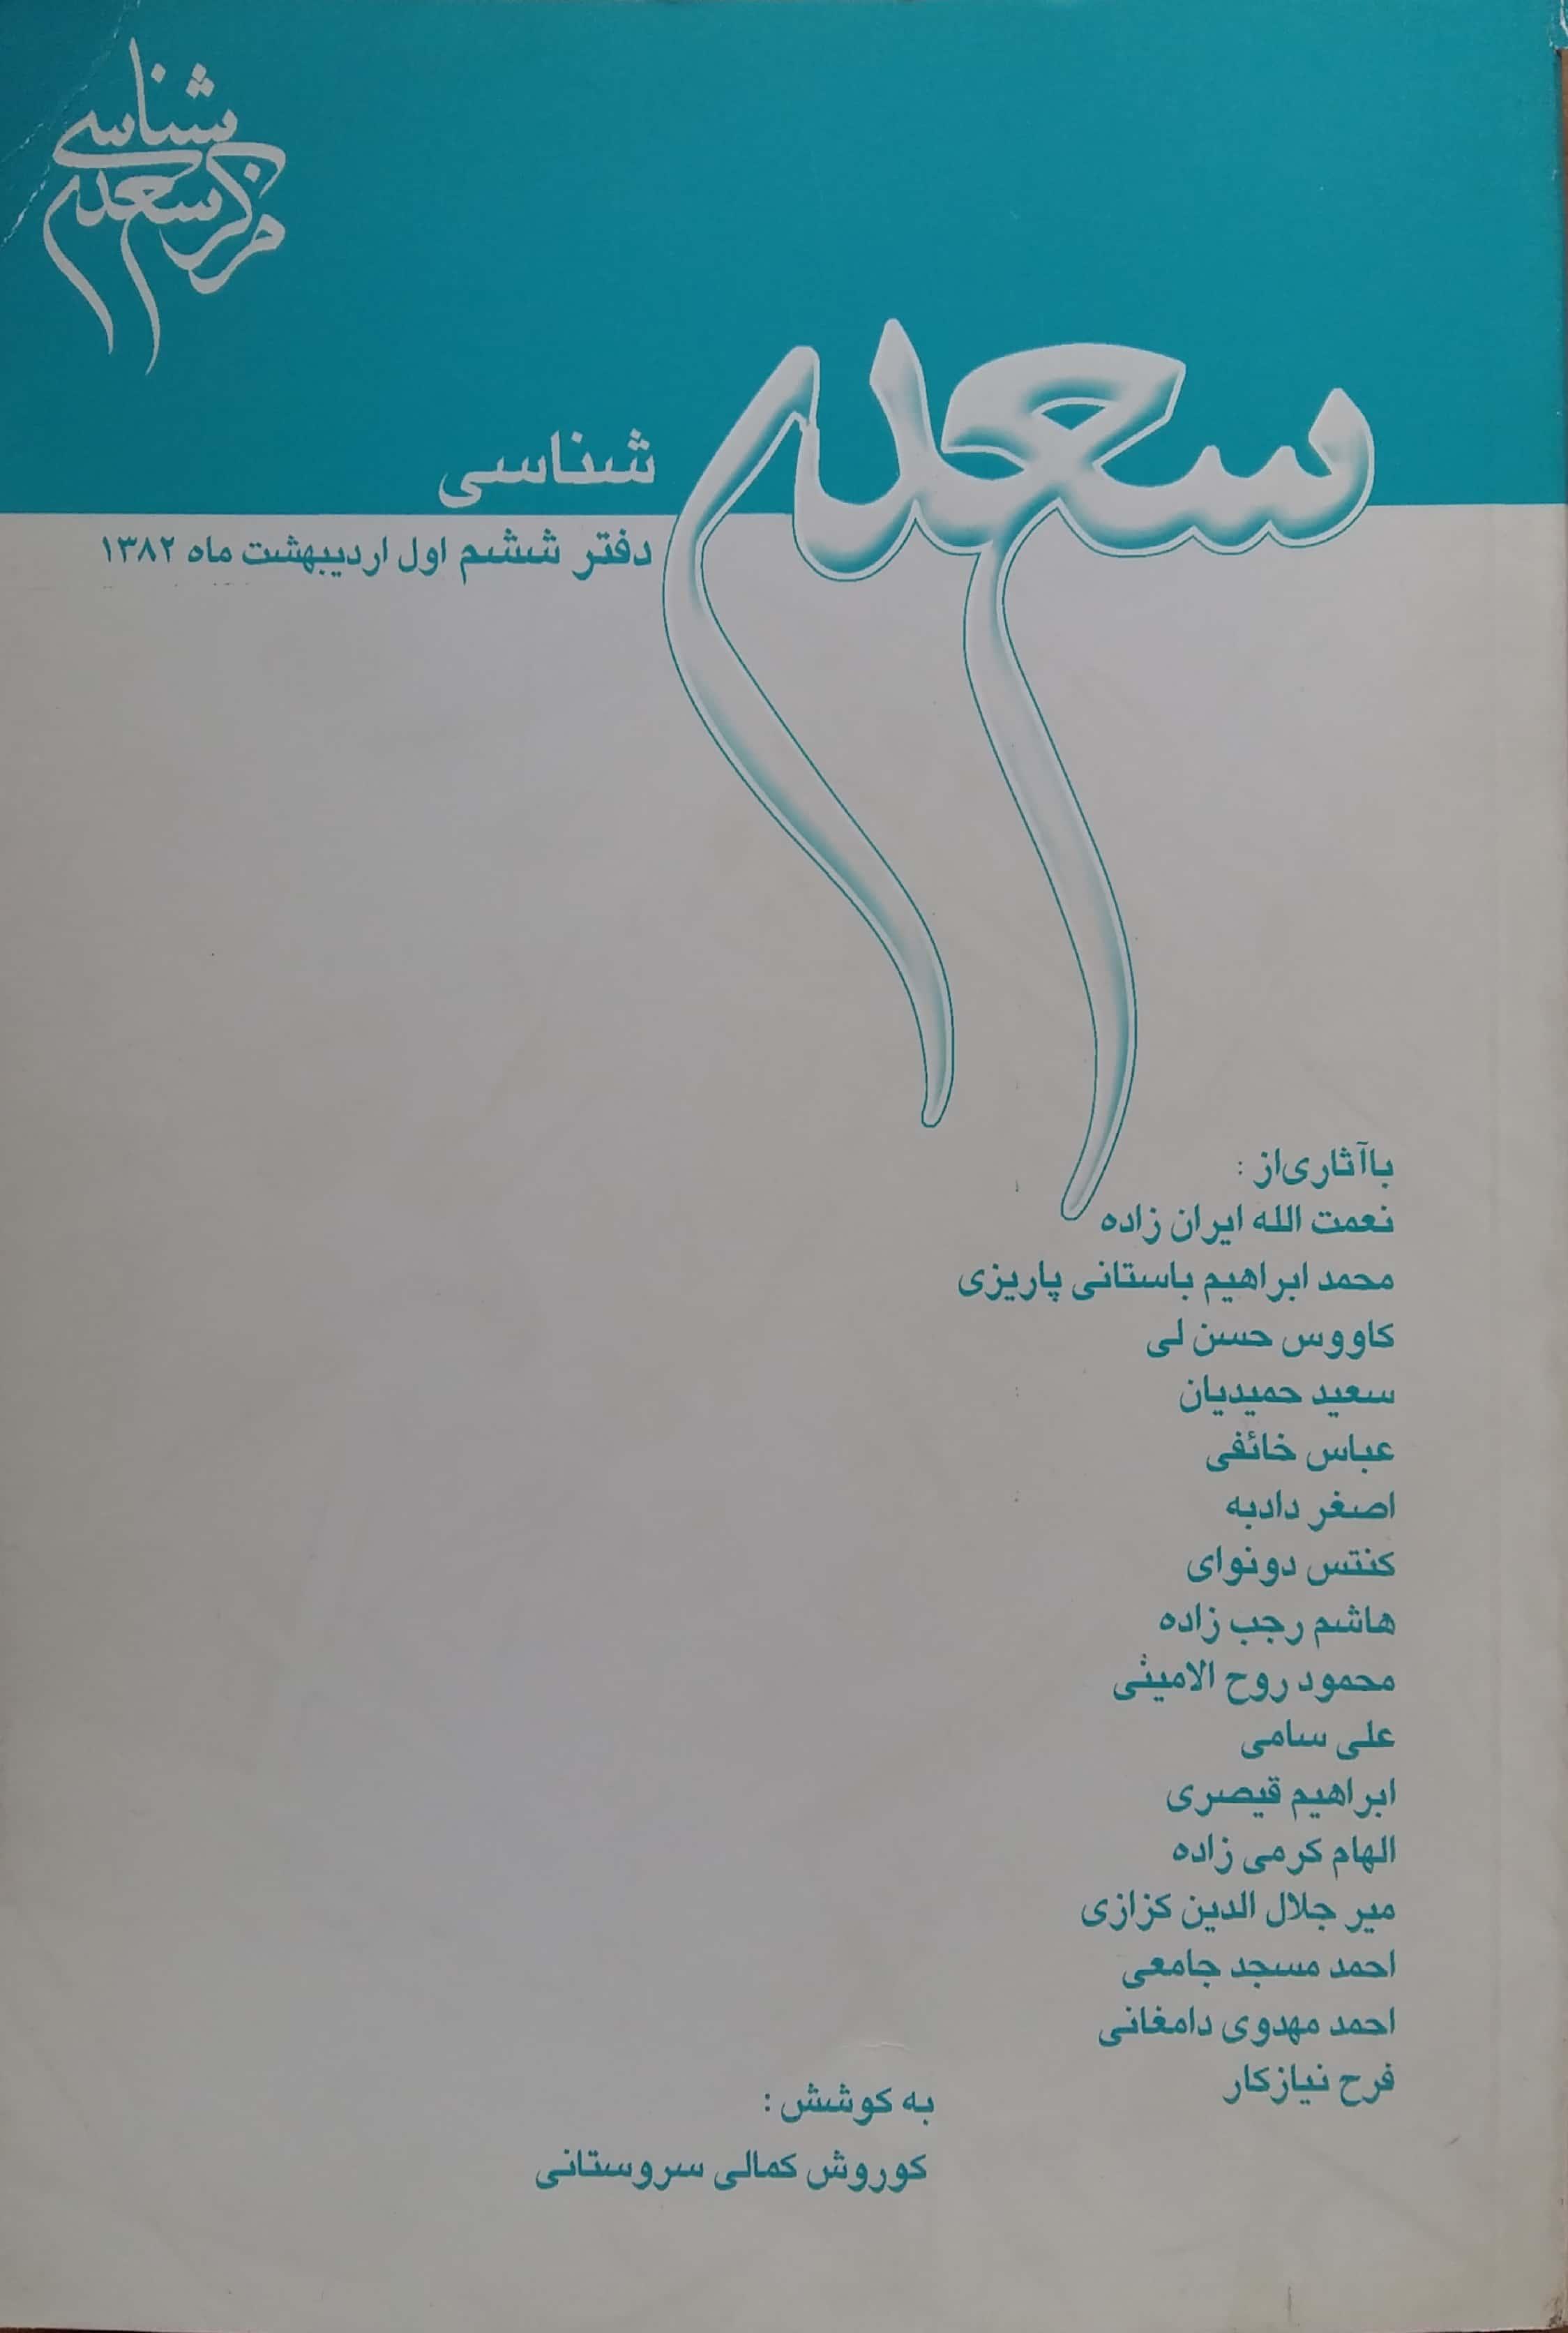 بنياد فارس شناسي سعدی شناسی دفتر ششم (به کوشش کوروش کمالی سروستانی)